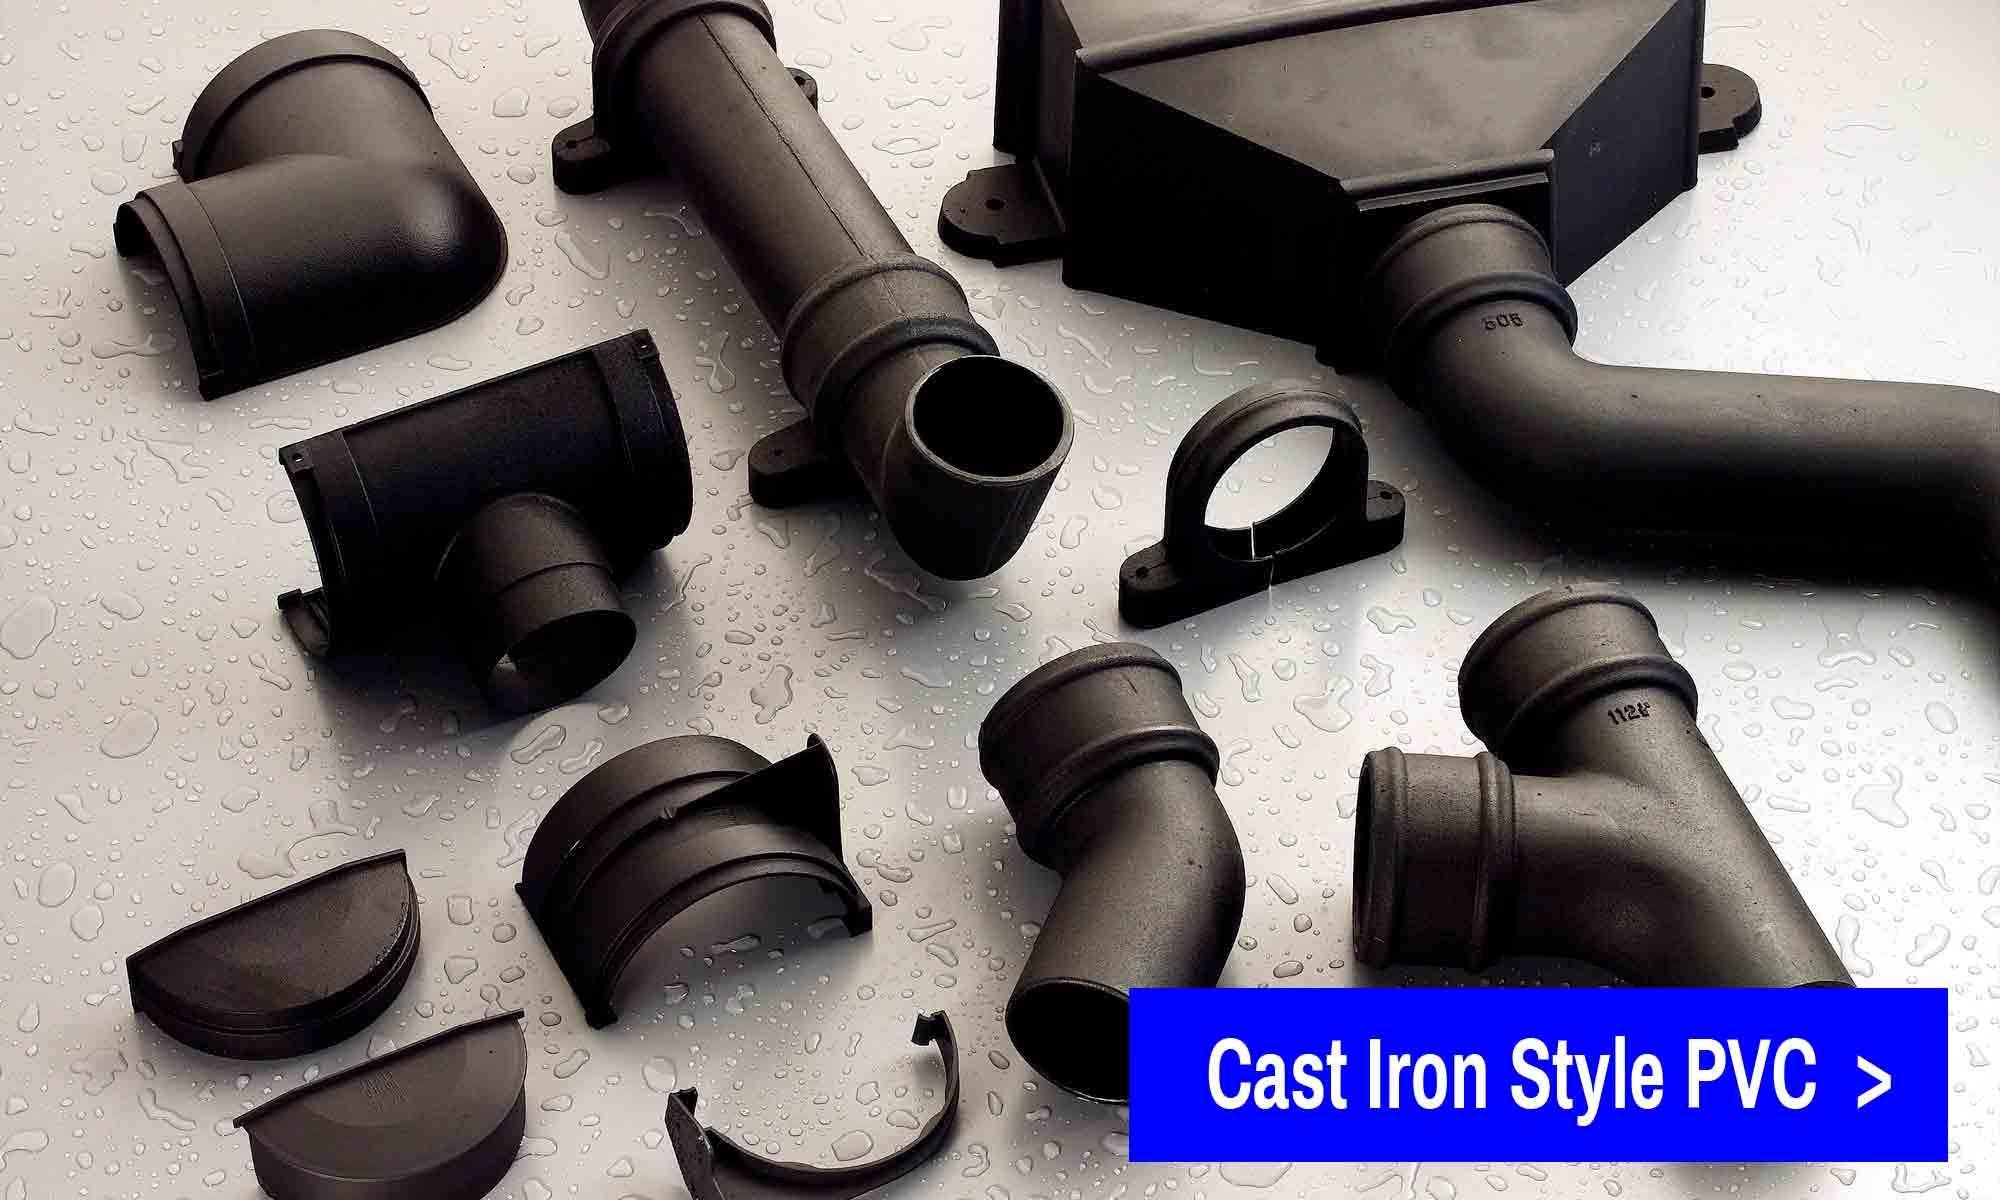 Cast Iron Style PVC